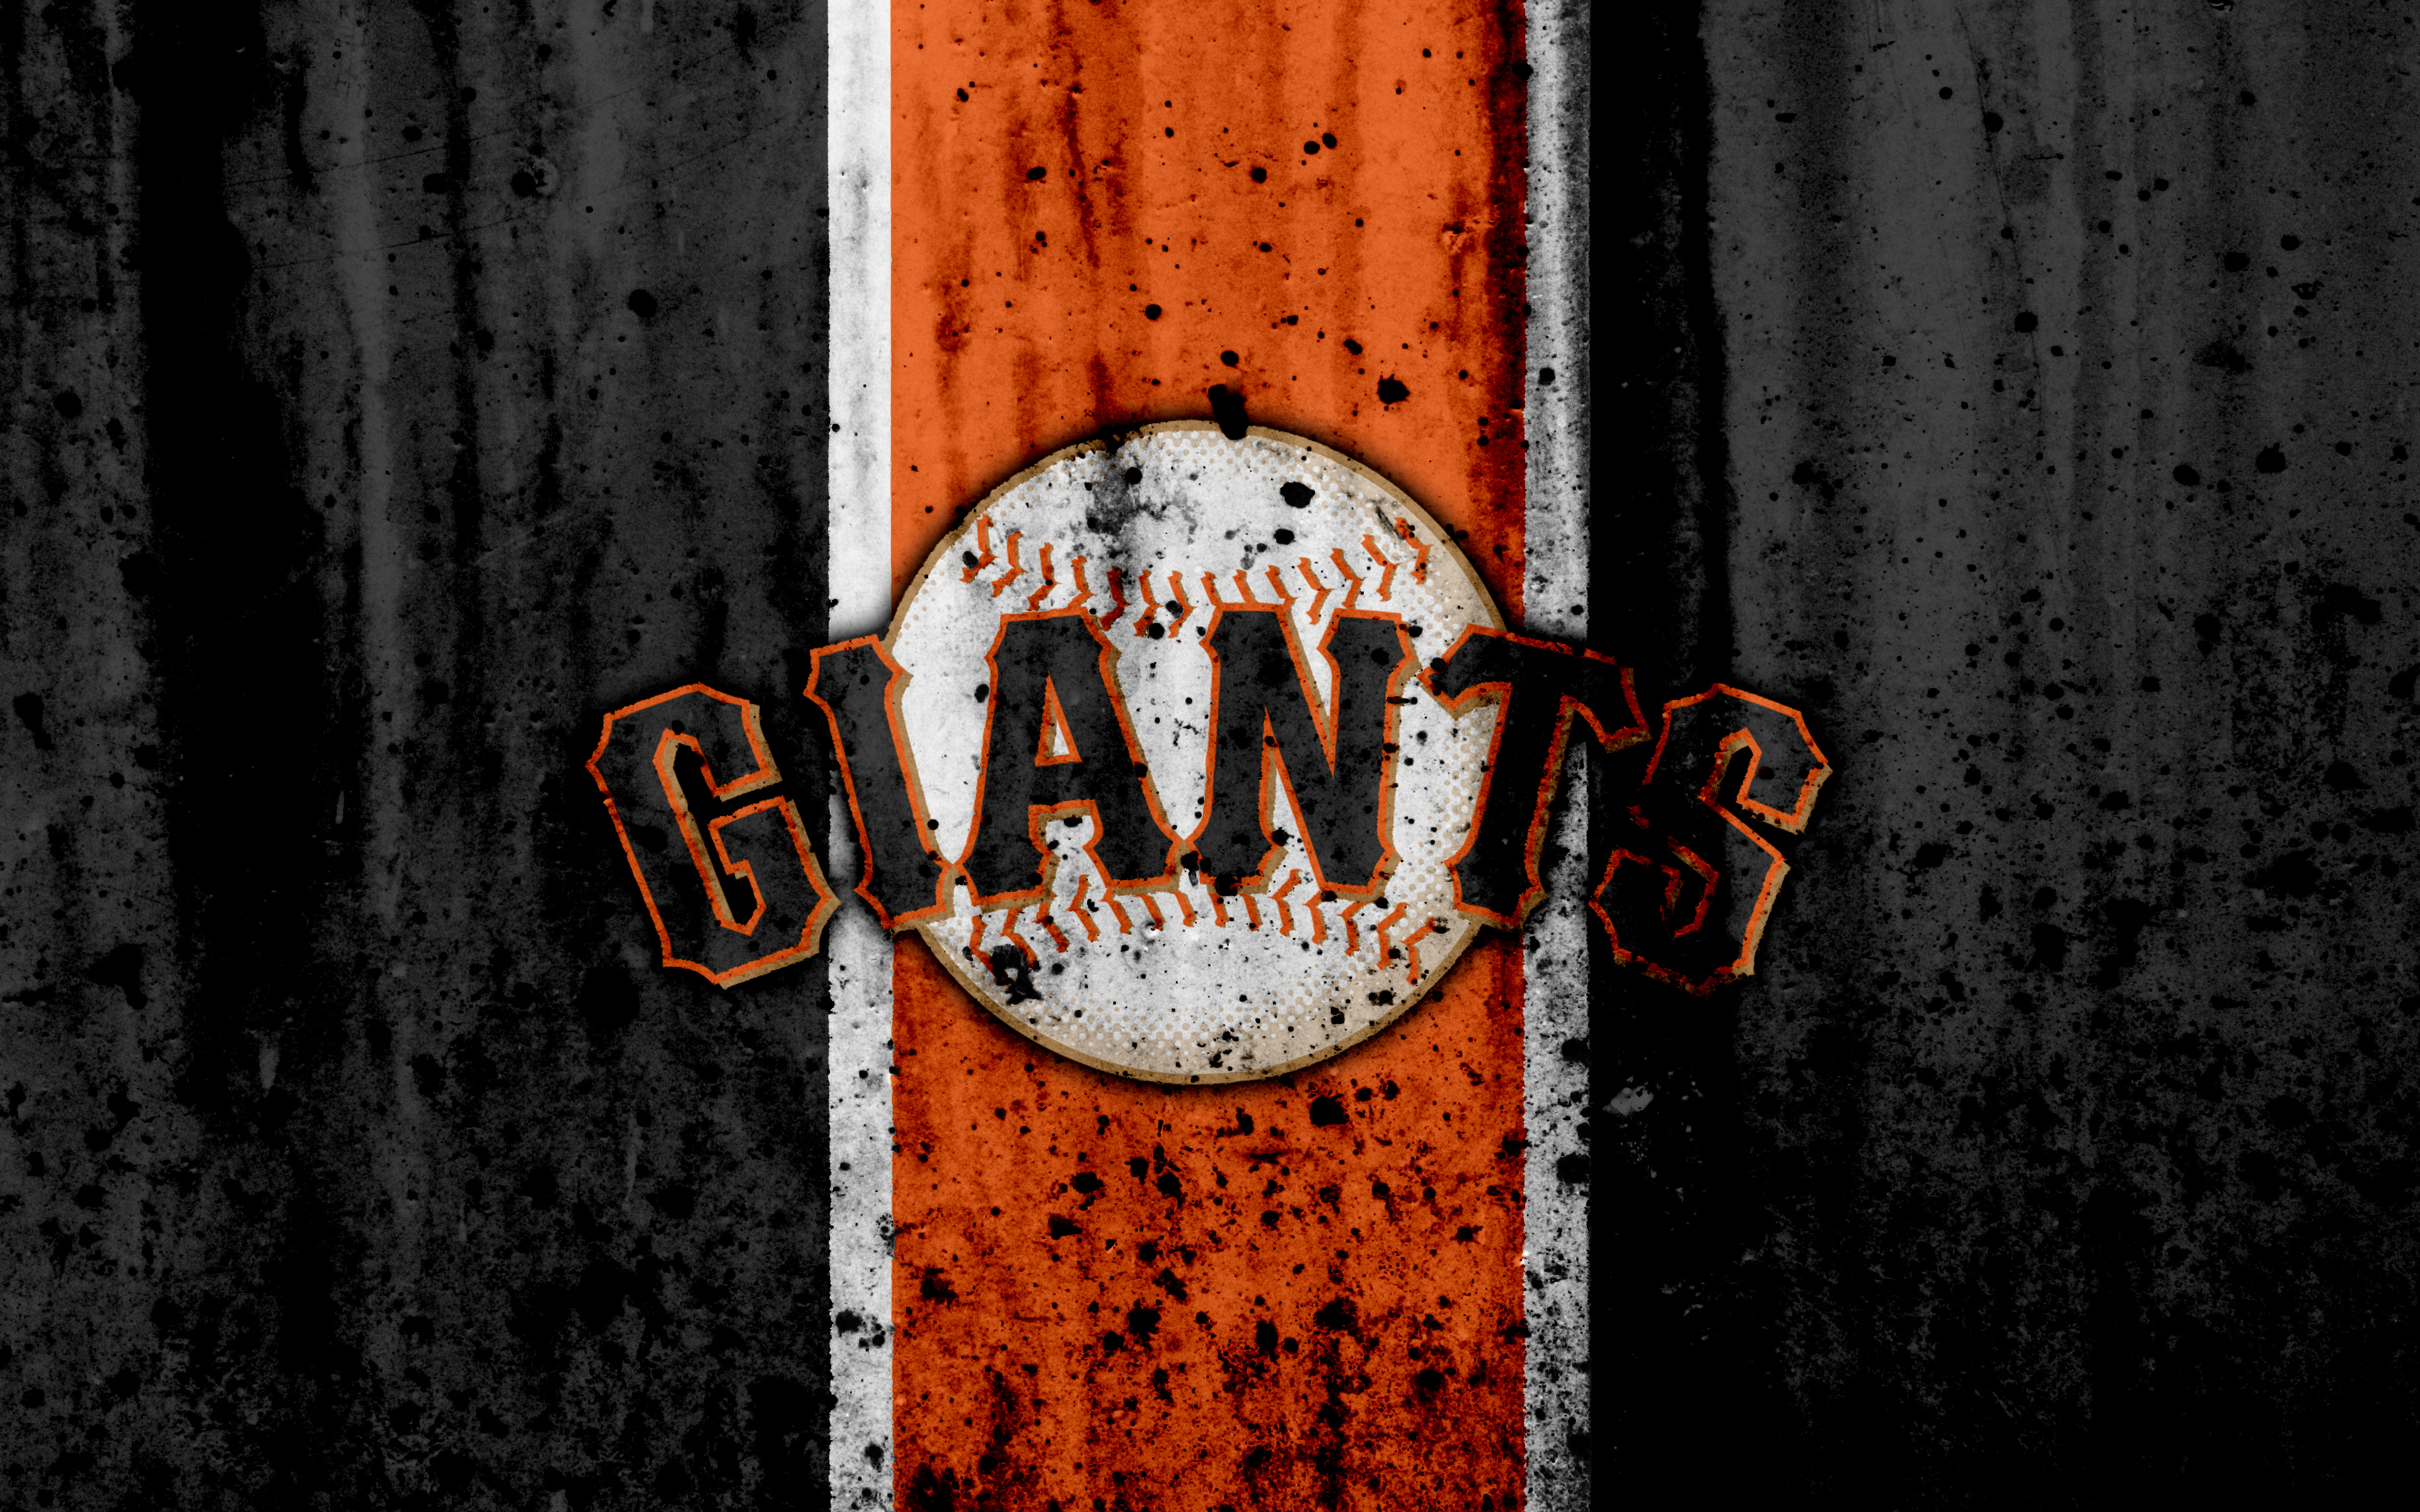 San Francisco Giants 4k Ultra Hd Wallpaper Background Image